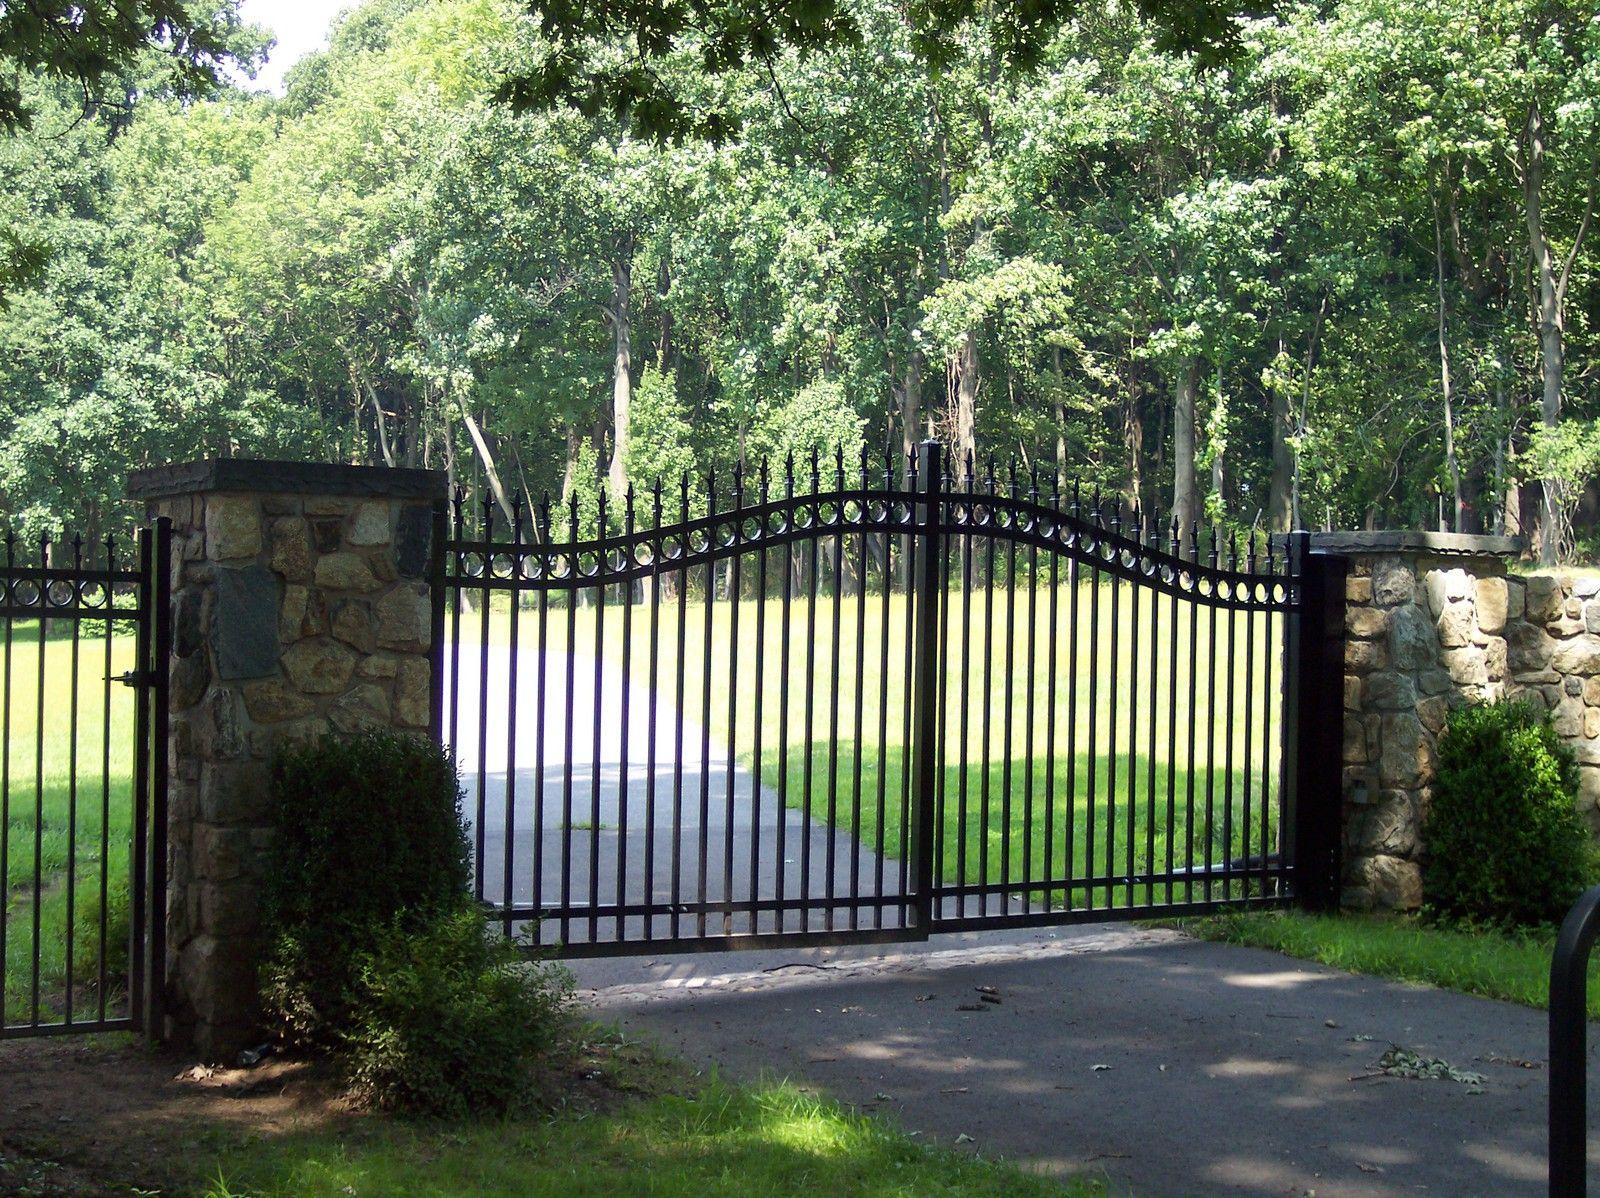 Entrance Gates Md And Sons Fencing Nj Entrance Gates Entrance